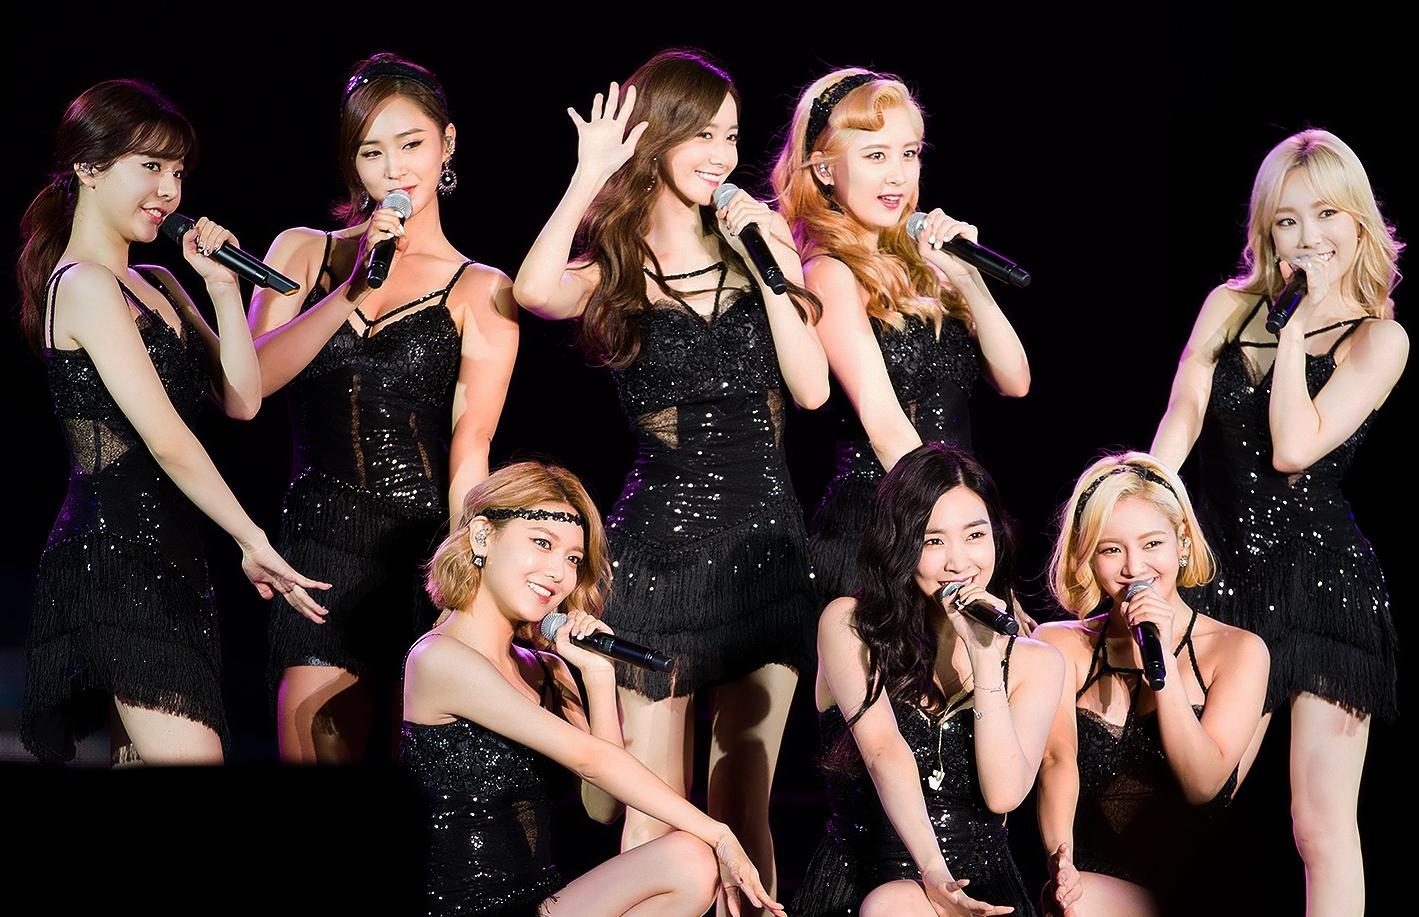 Girls'_Generation_at_DMC_Festival_2015_MBC_Radio_DJ_Concert_02